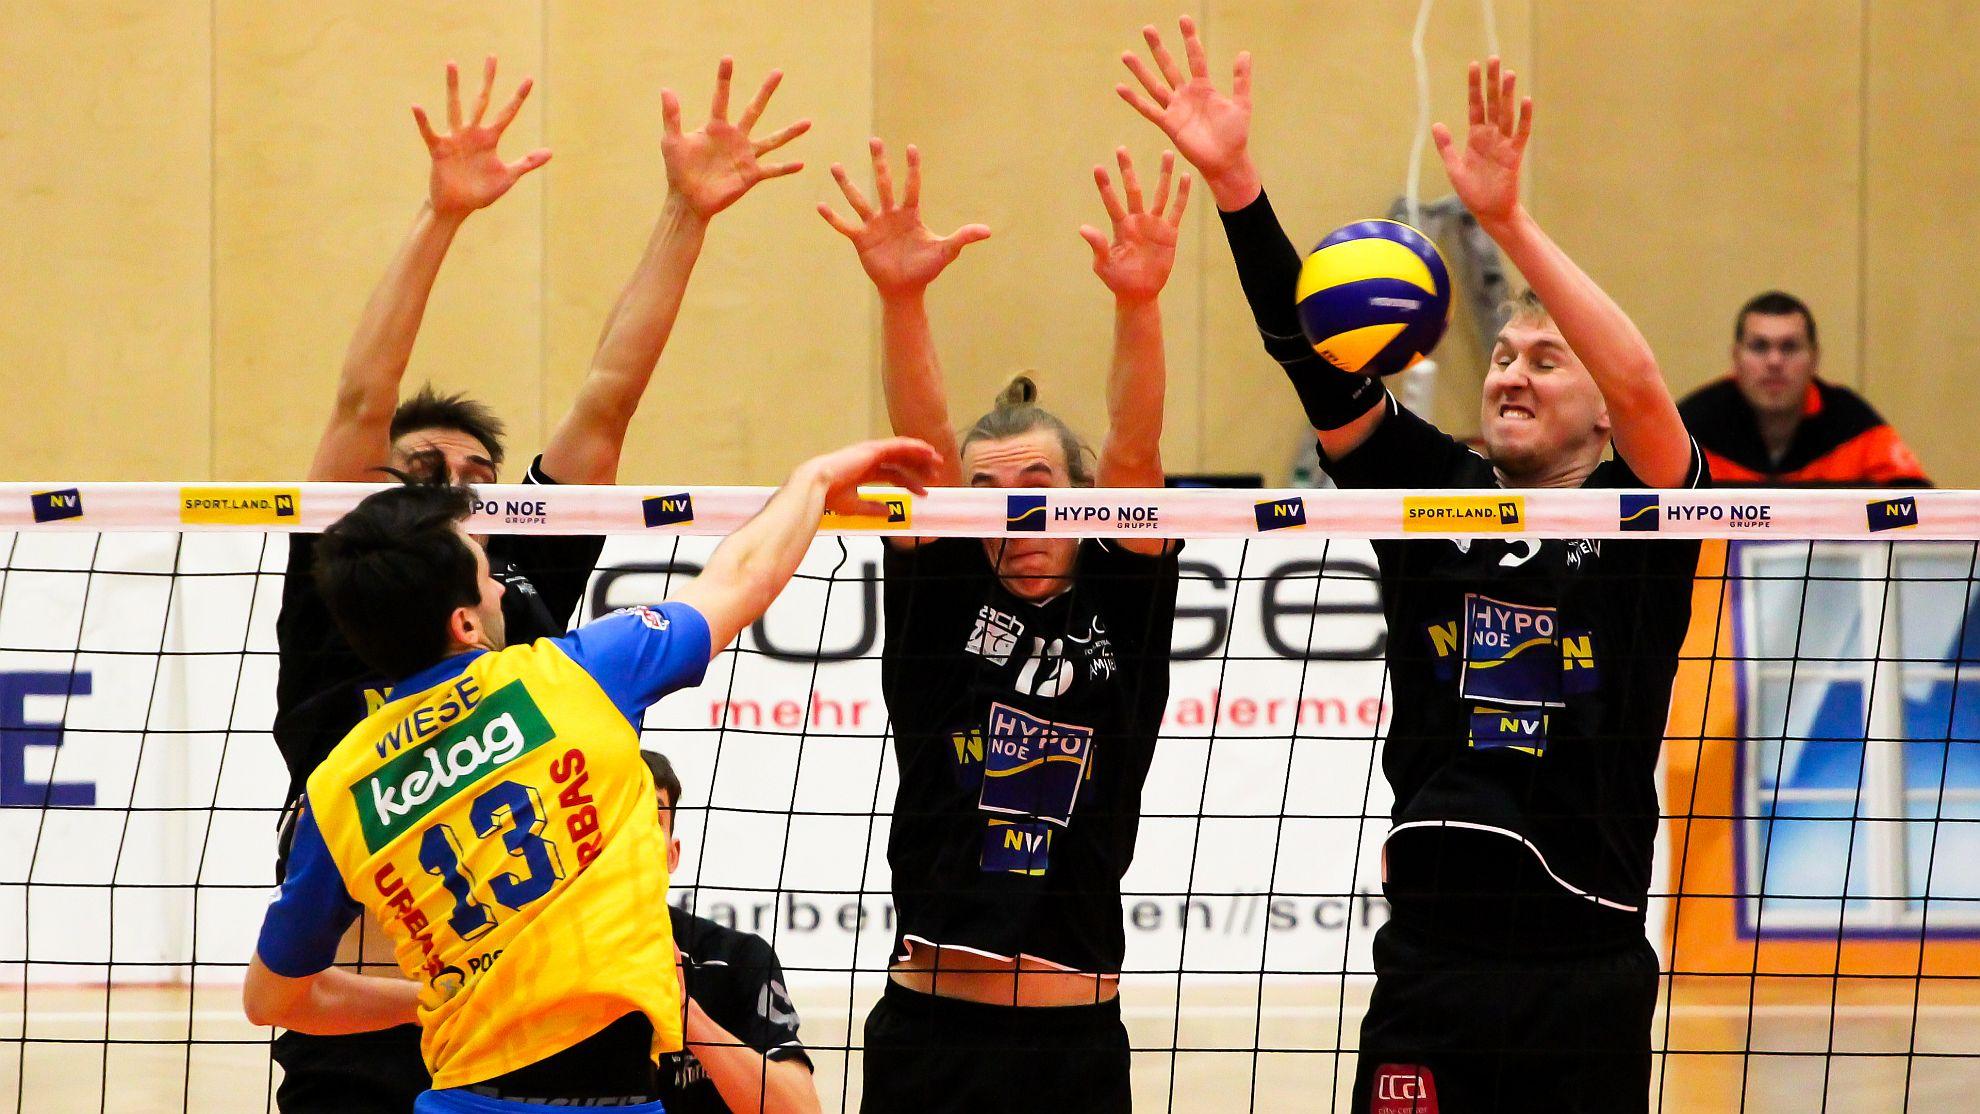 SG VCA Amstetten NÖ/hotVolleys vs. SK Posojilnica Aich/Dob 2018 - FOTO © Peter Maurer